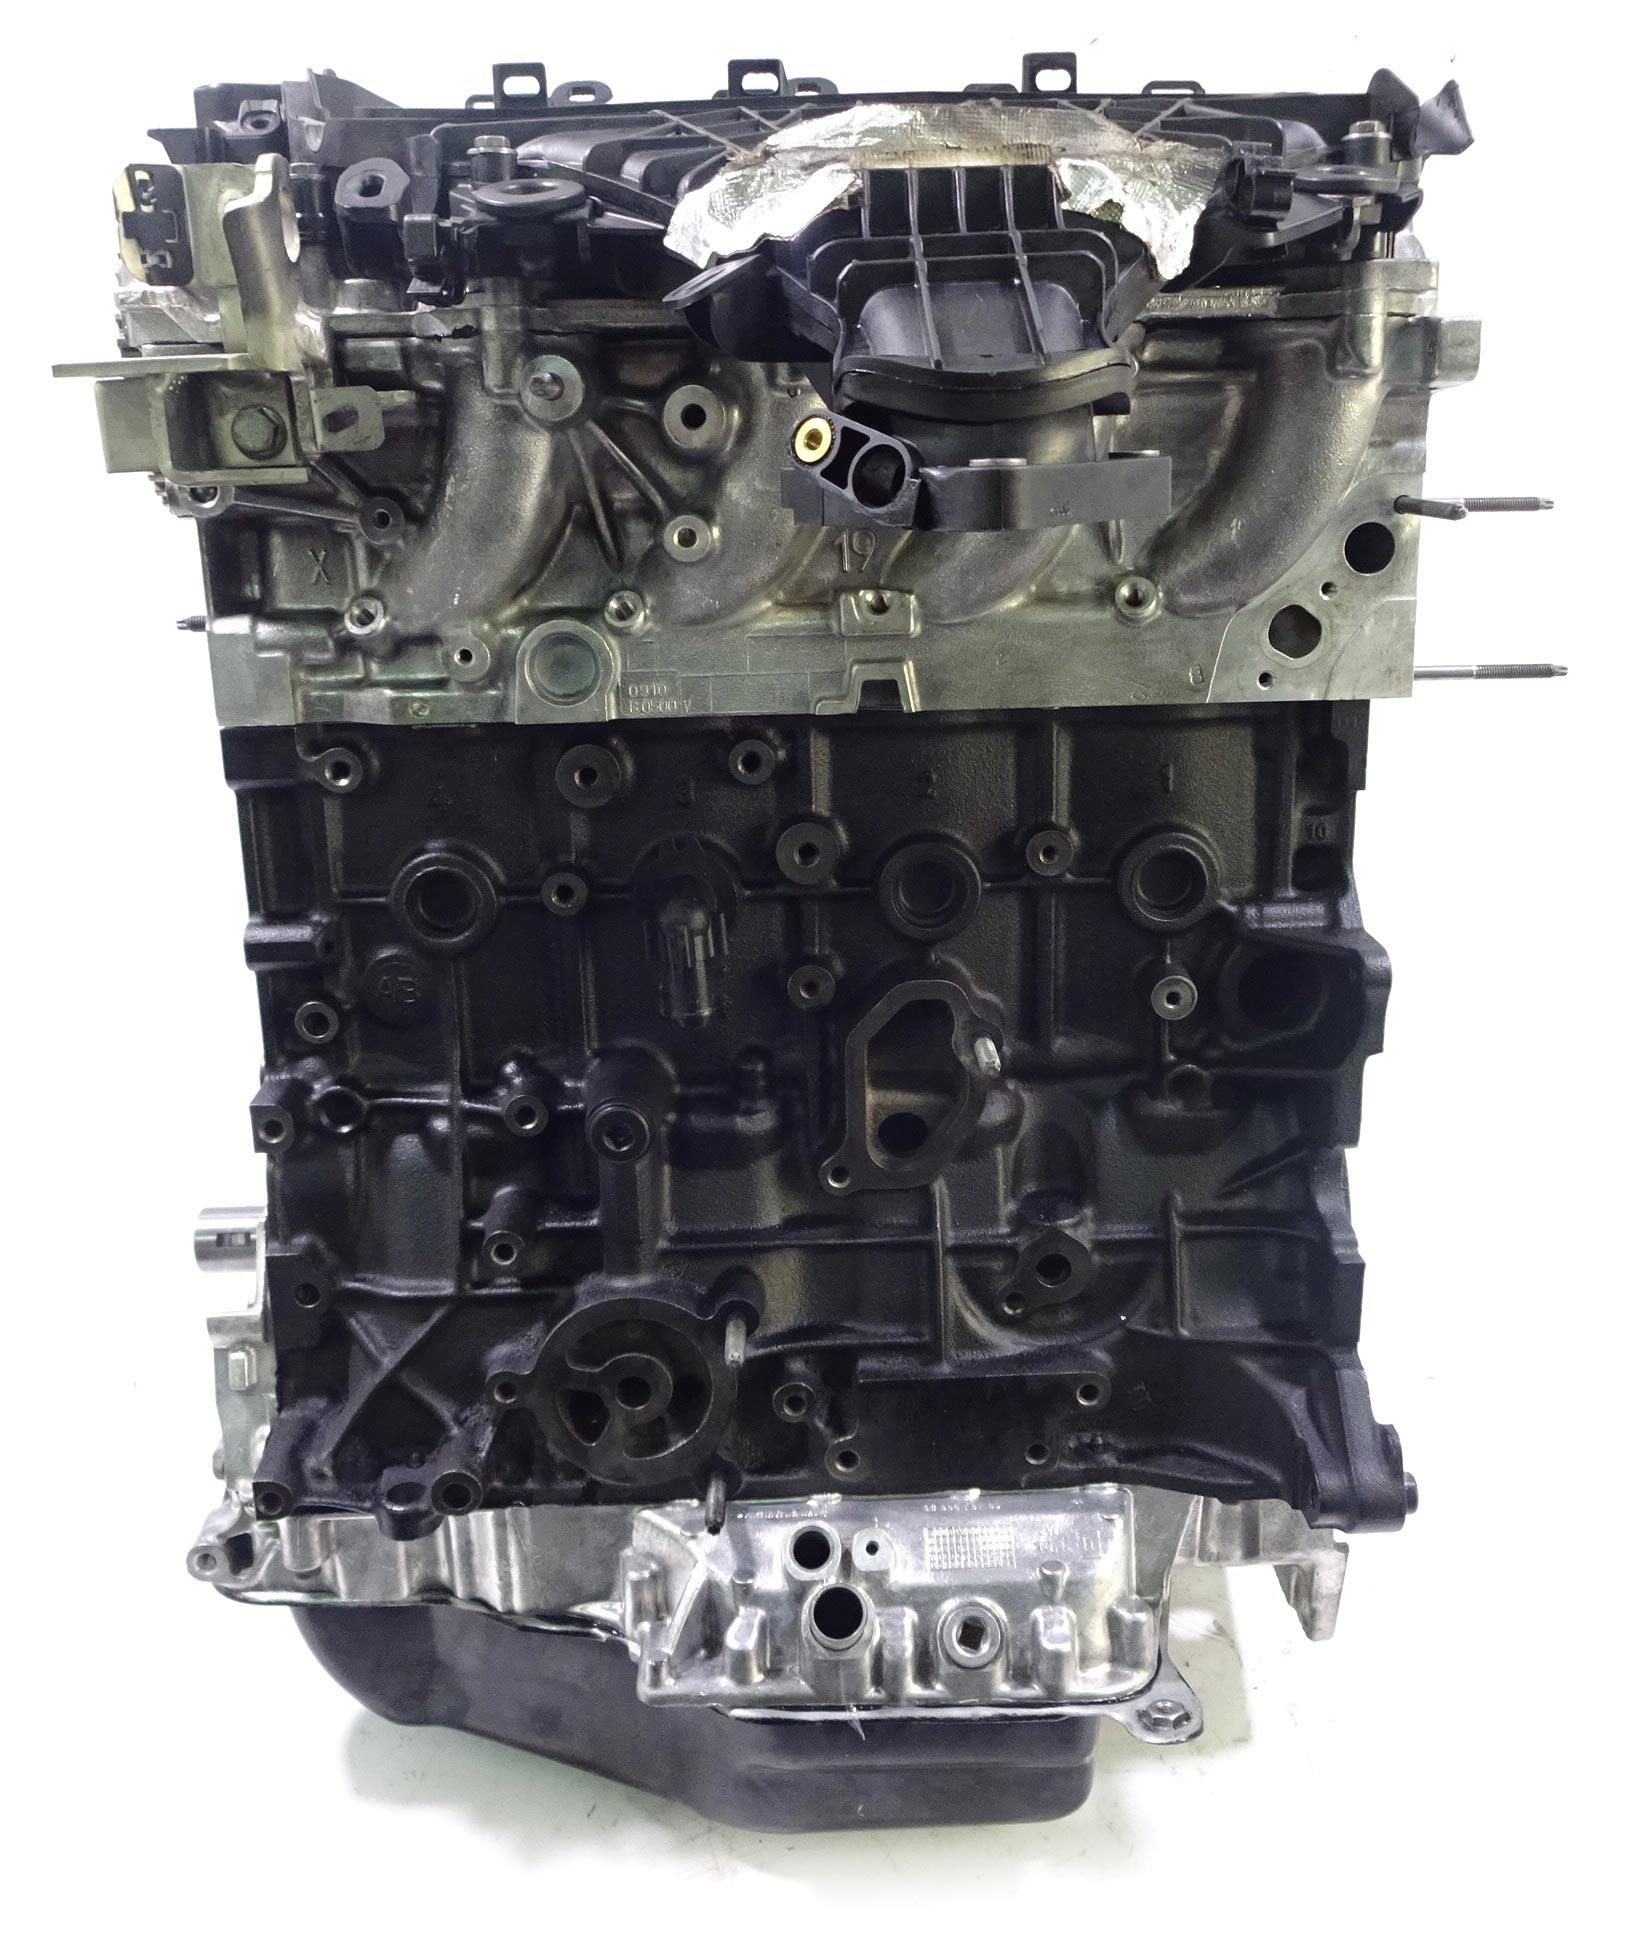 Motor 2012 Fiat Scudo 2,0 D Diesel Multijet RH02 Kopf geplant Dichtung NEU